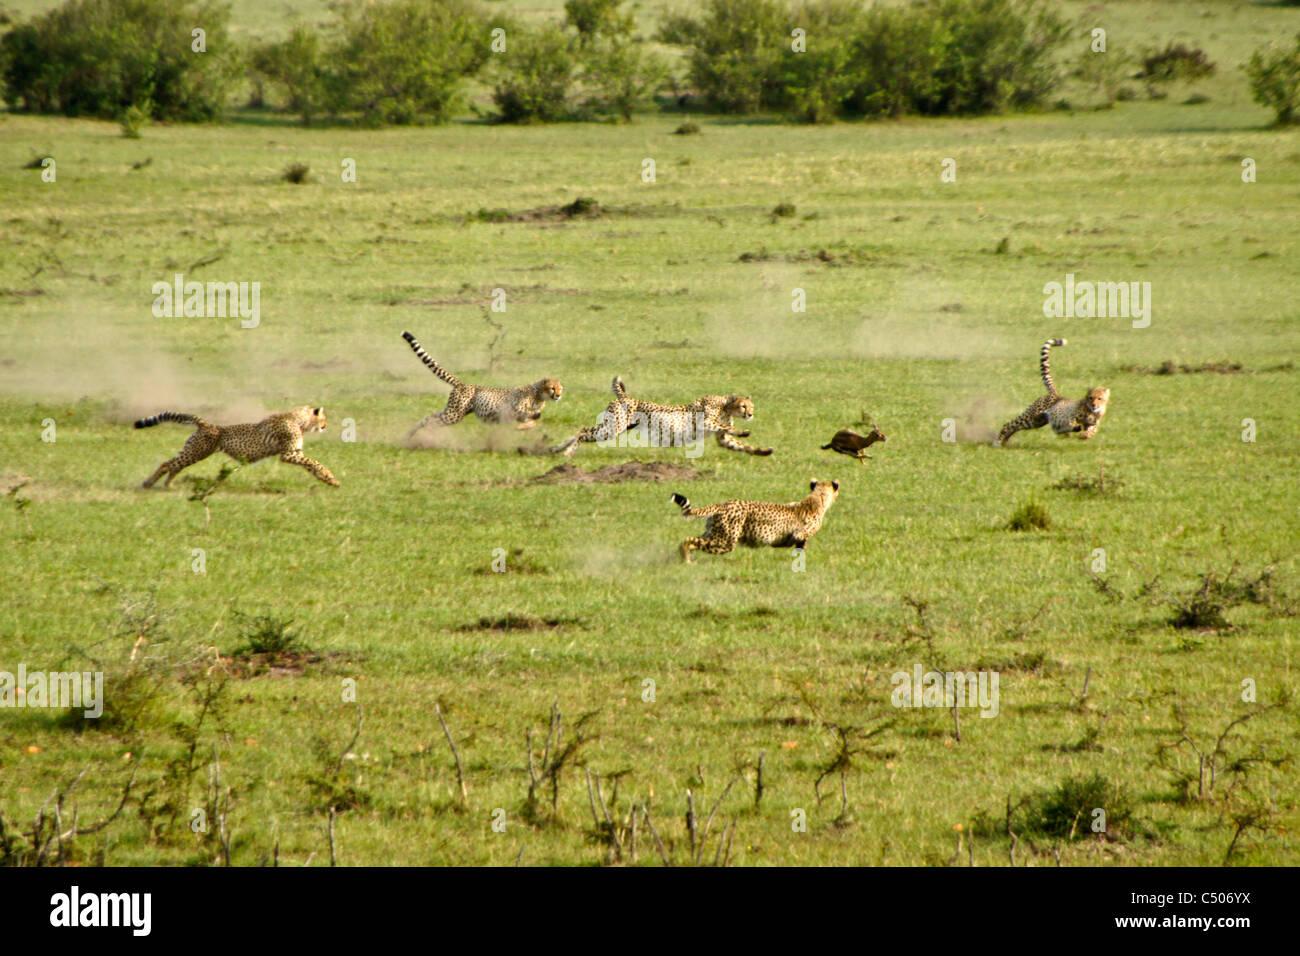 Cheetah and cubs chasing Thomson's gazelle, Masai Mara, Kenya - Stock Image